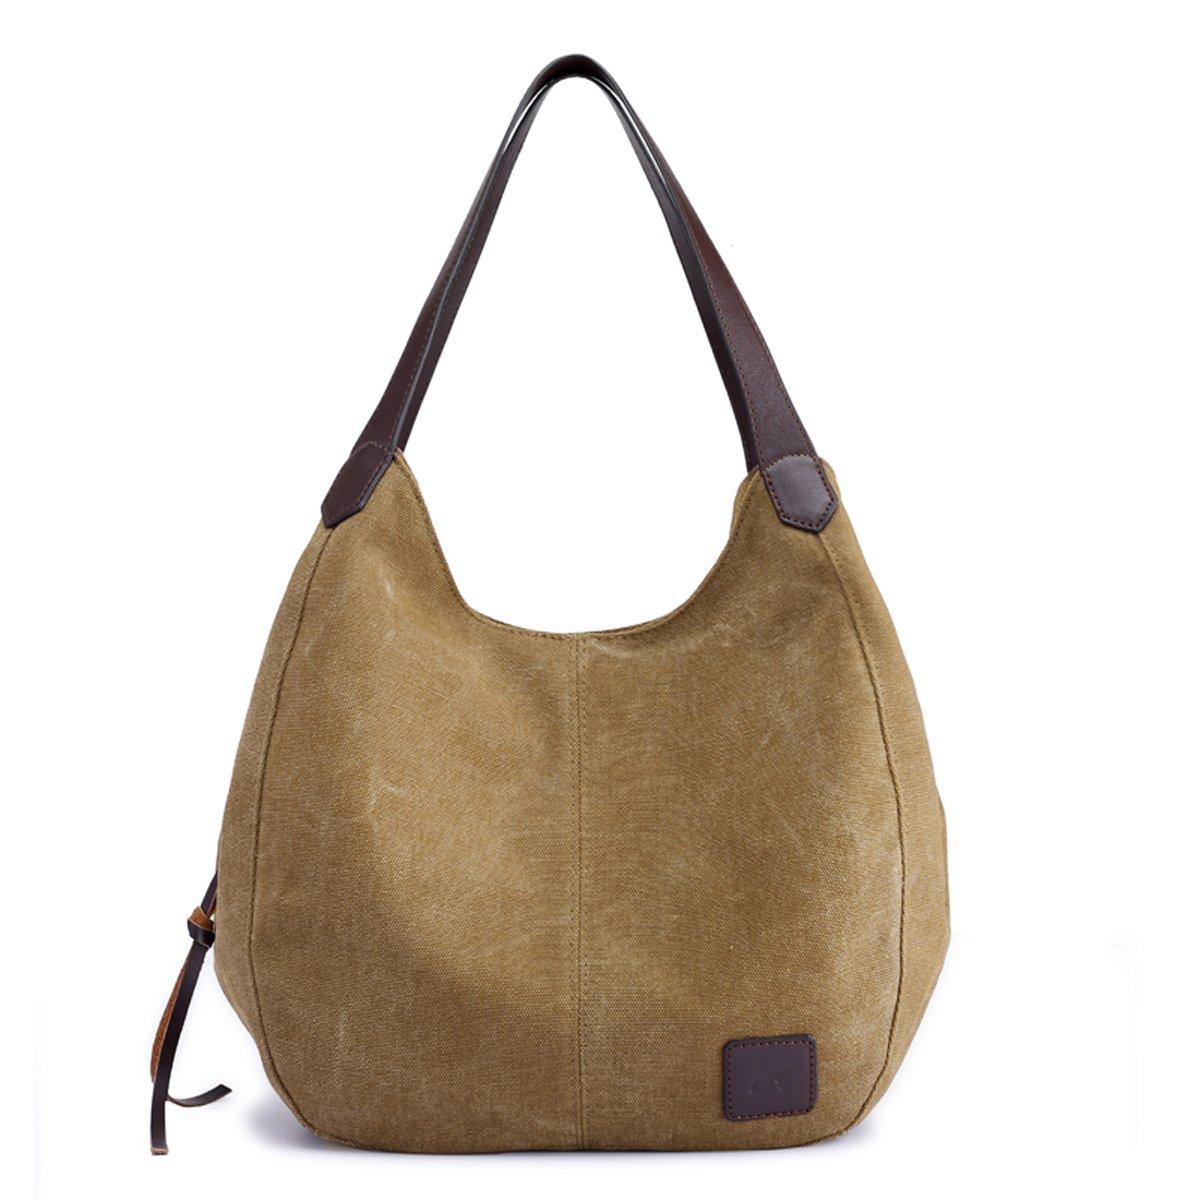 Hiigoo Fashion Women's Multi-pocket Cotton Canvas Handbags Shoulder Bags Totes Purses (Khaki)